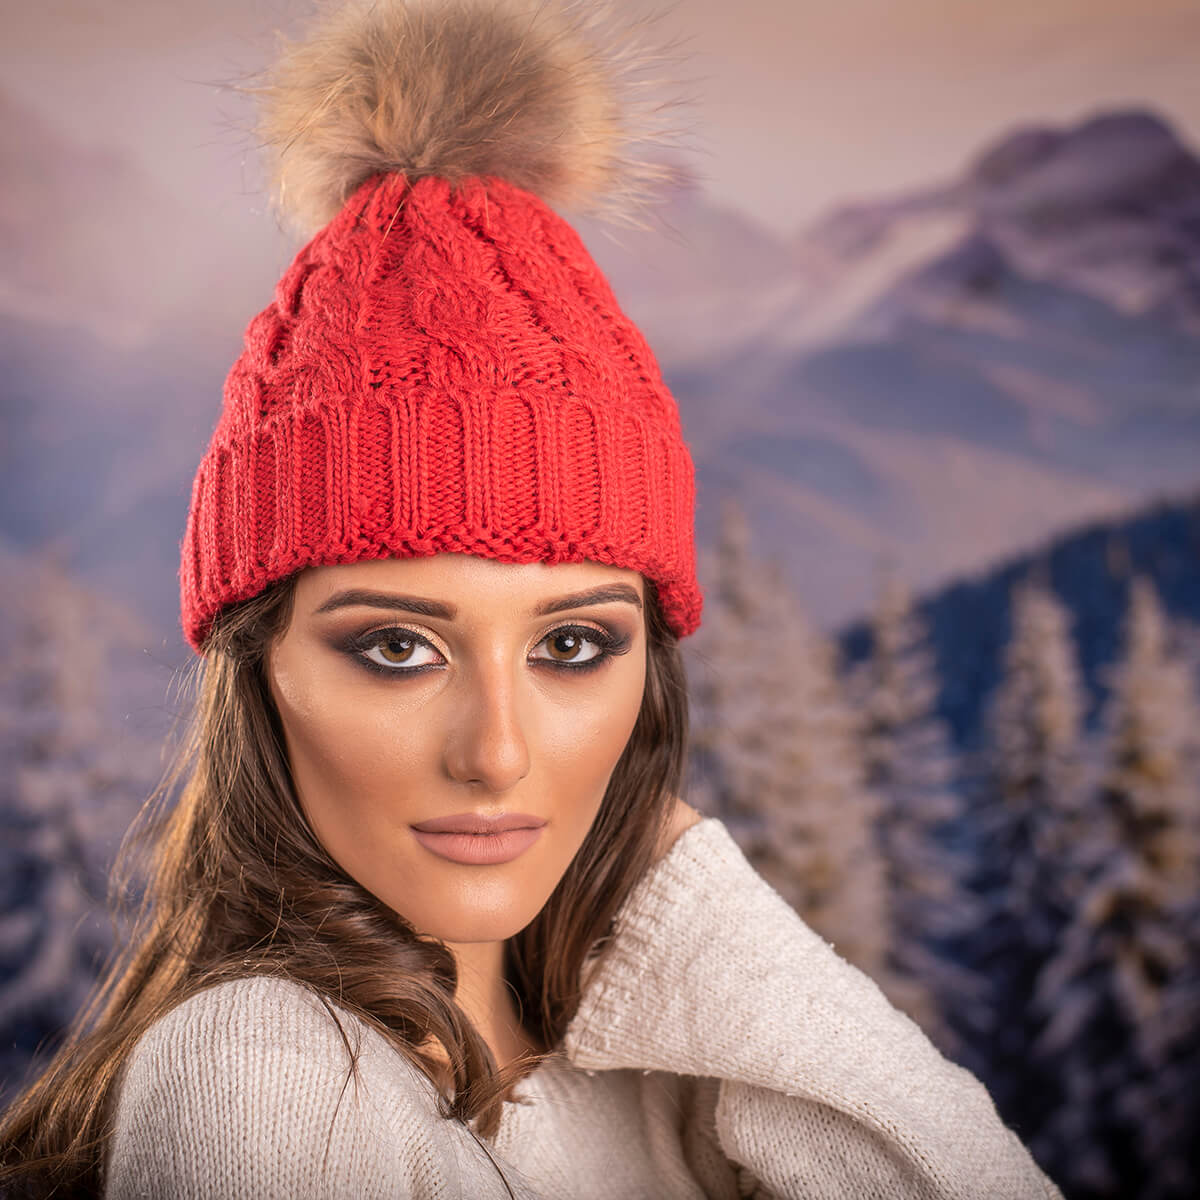 Дамска Зимна Шапка Плетена в Светло Червено